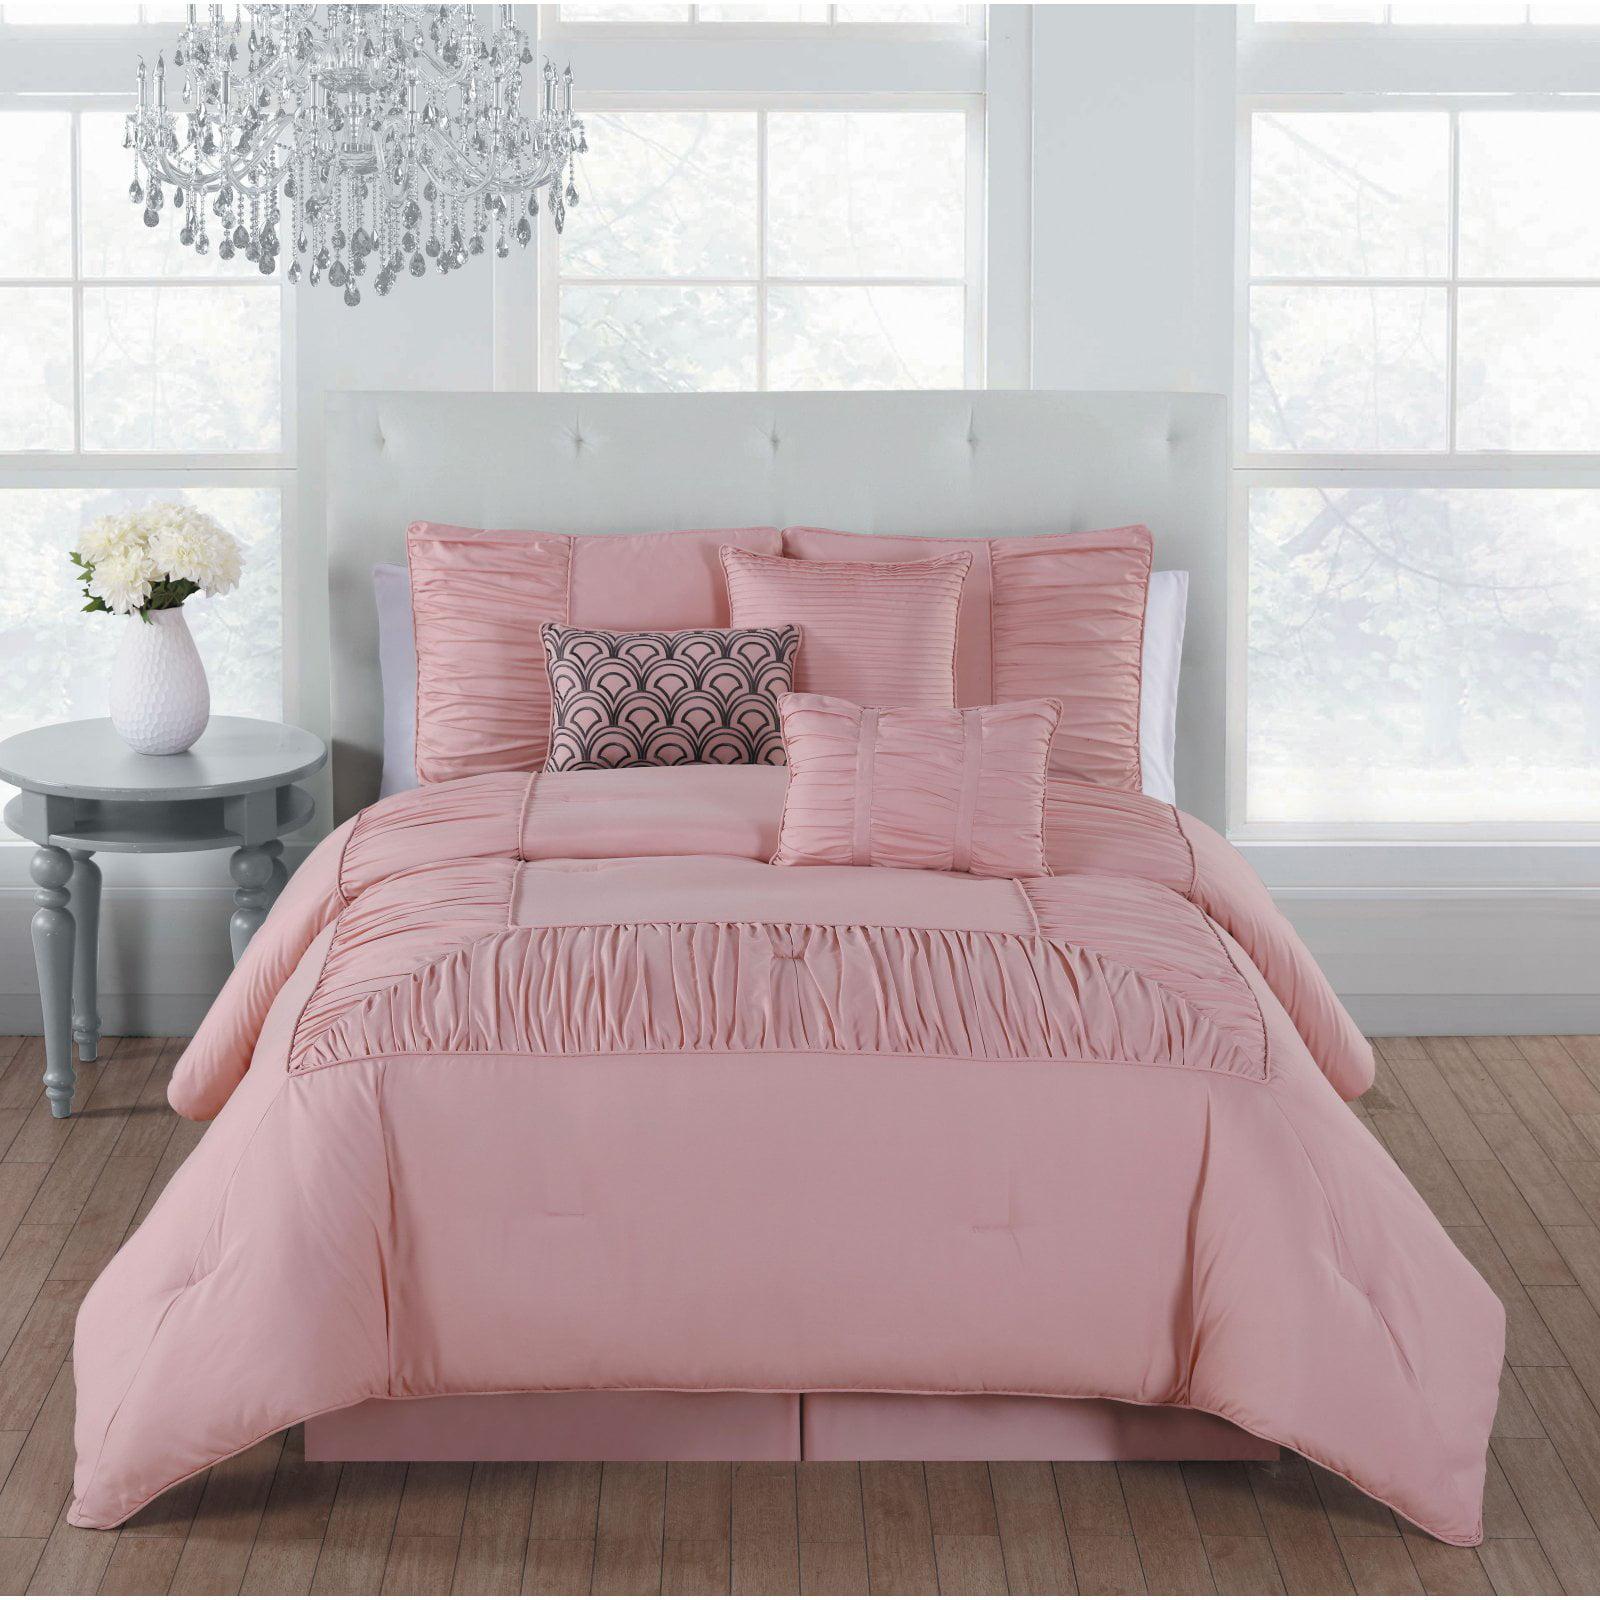 Jules 7 Piece Comforter Set by Avondale Manor